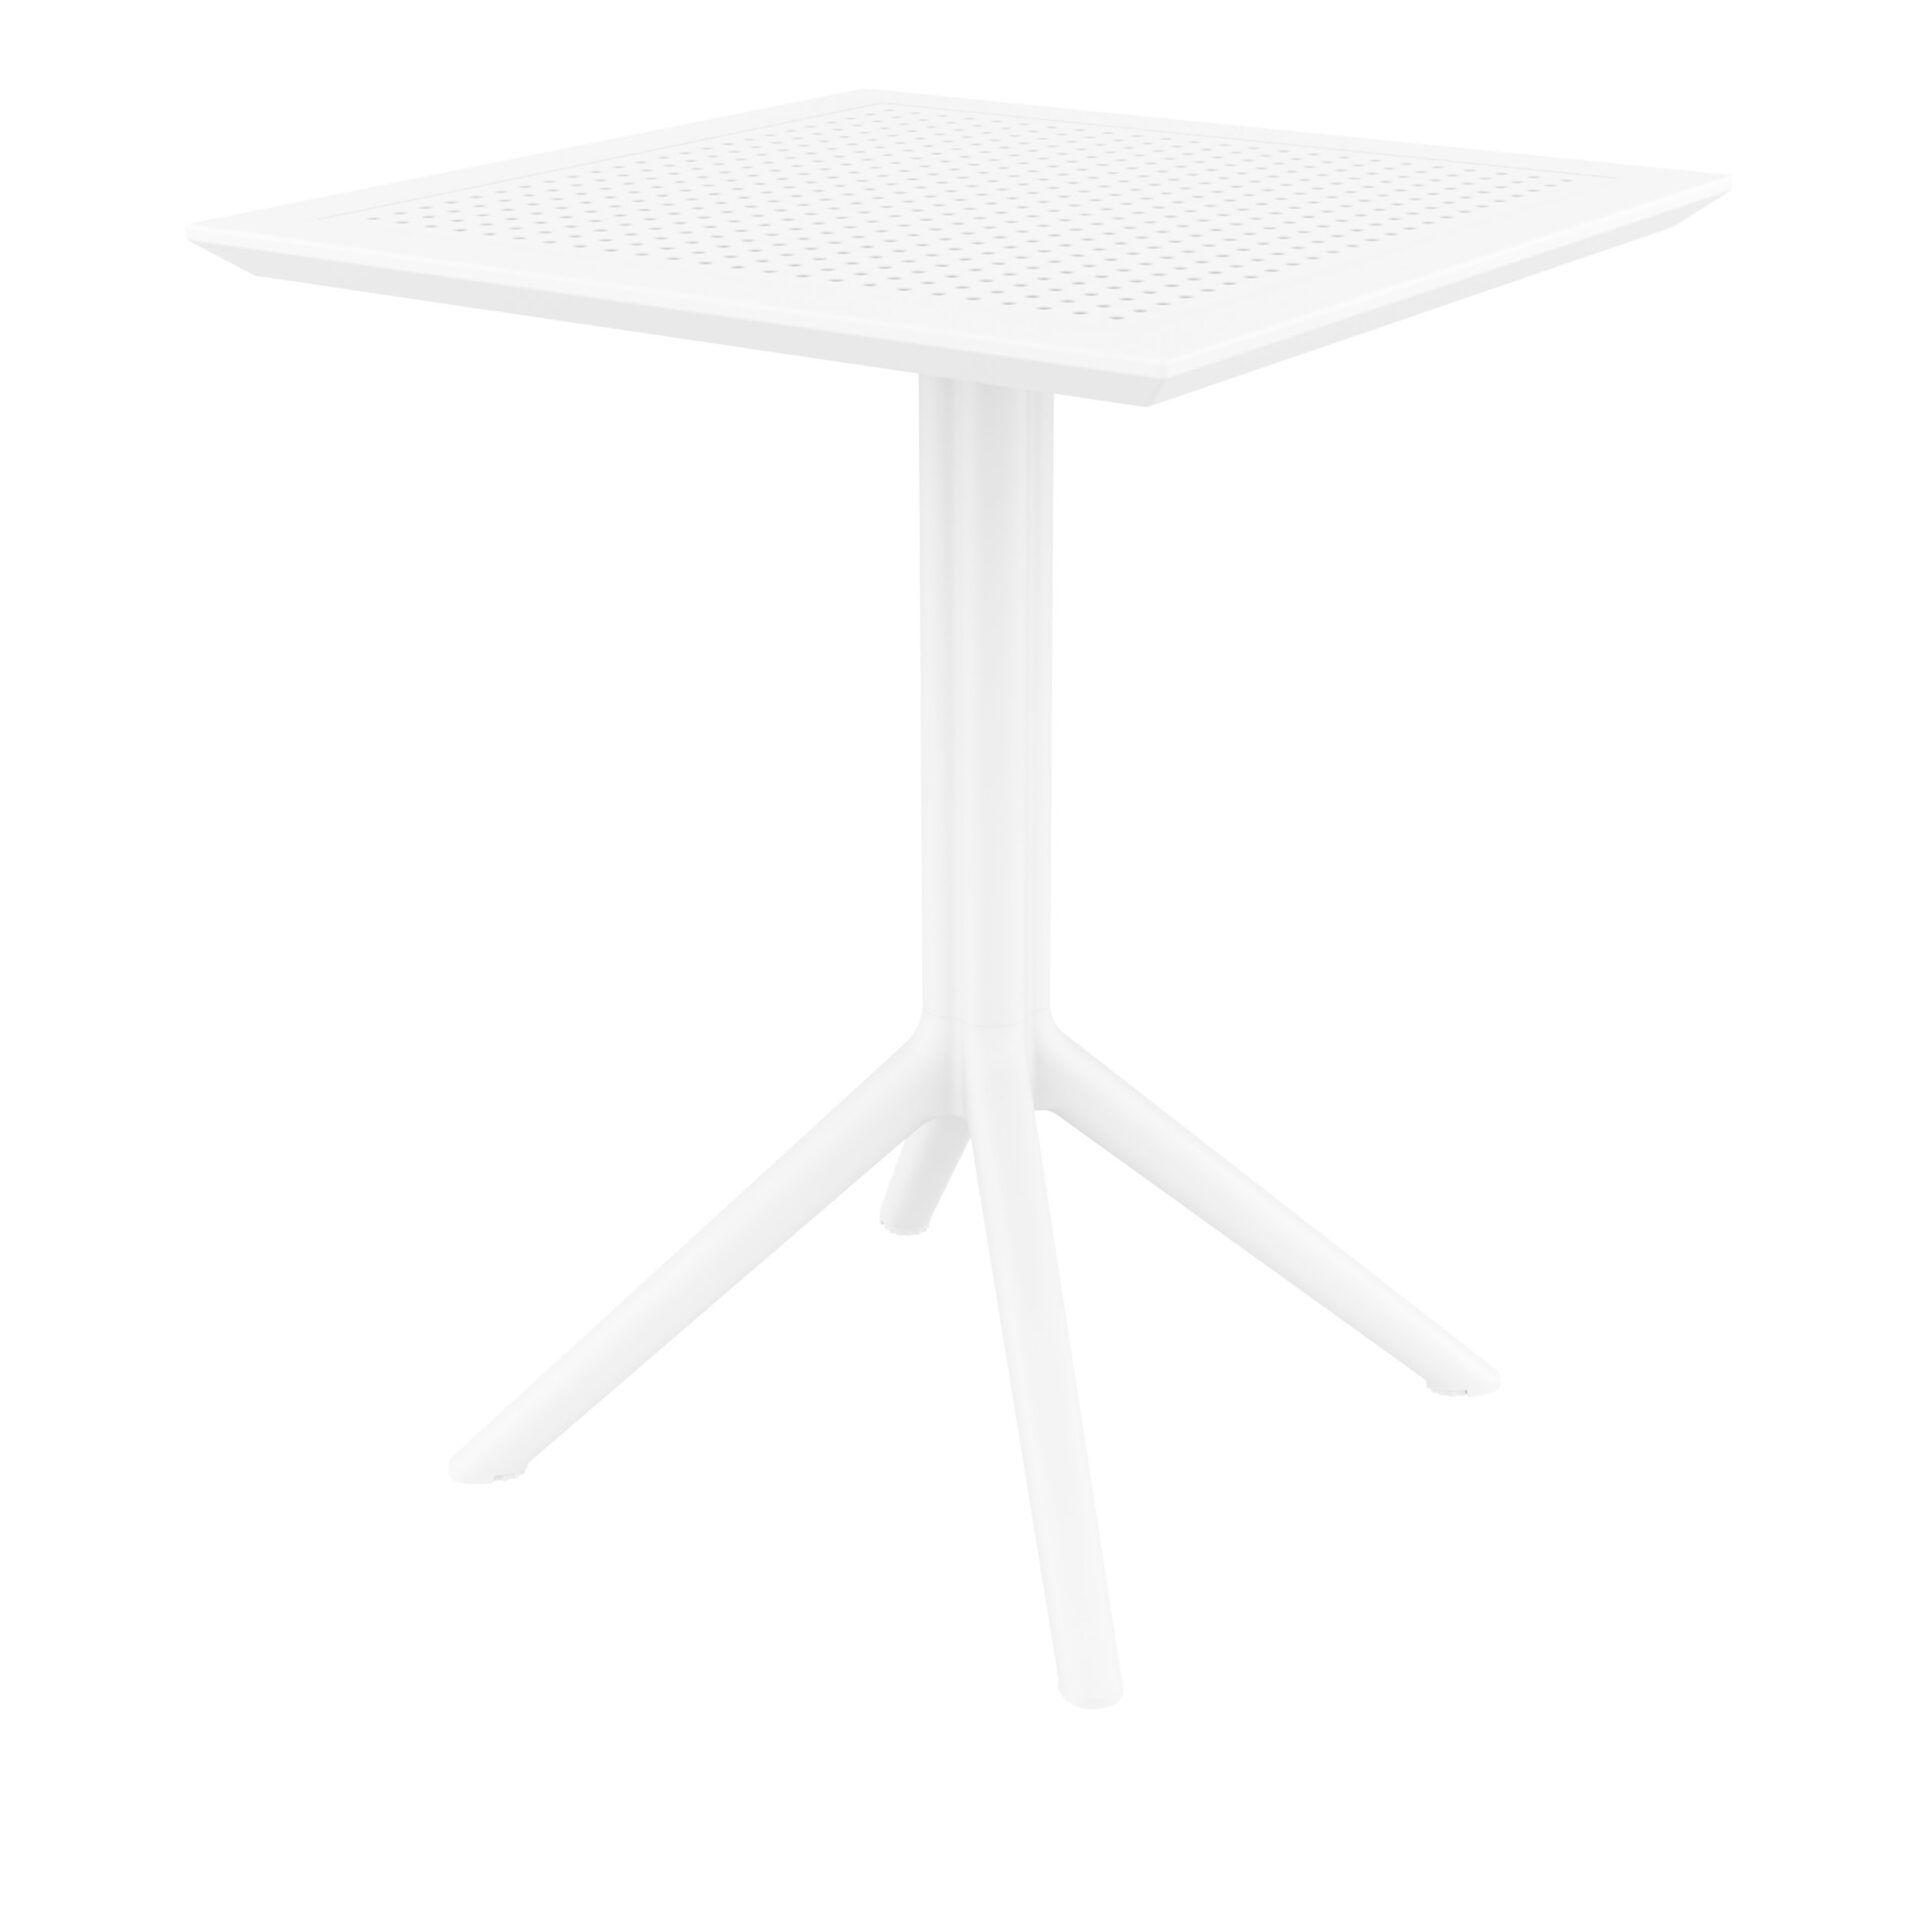 polypropylene outdoor sky folding bar table 60 white front side